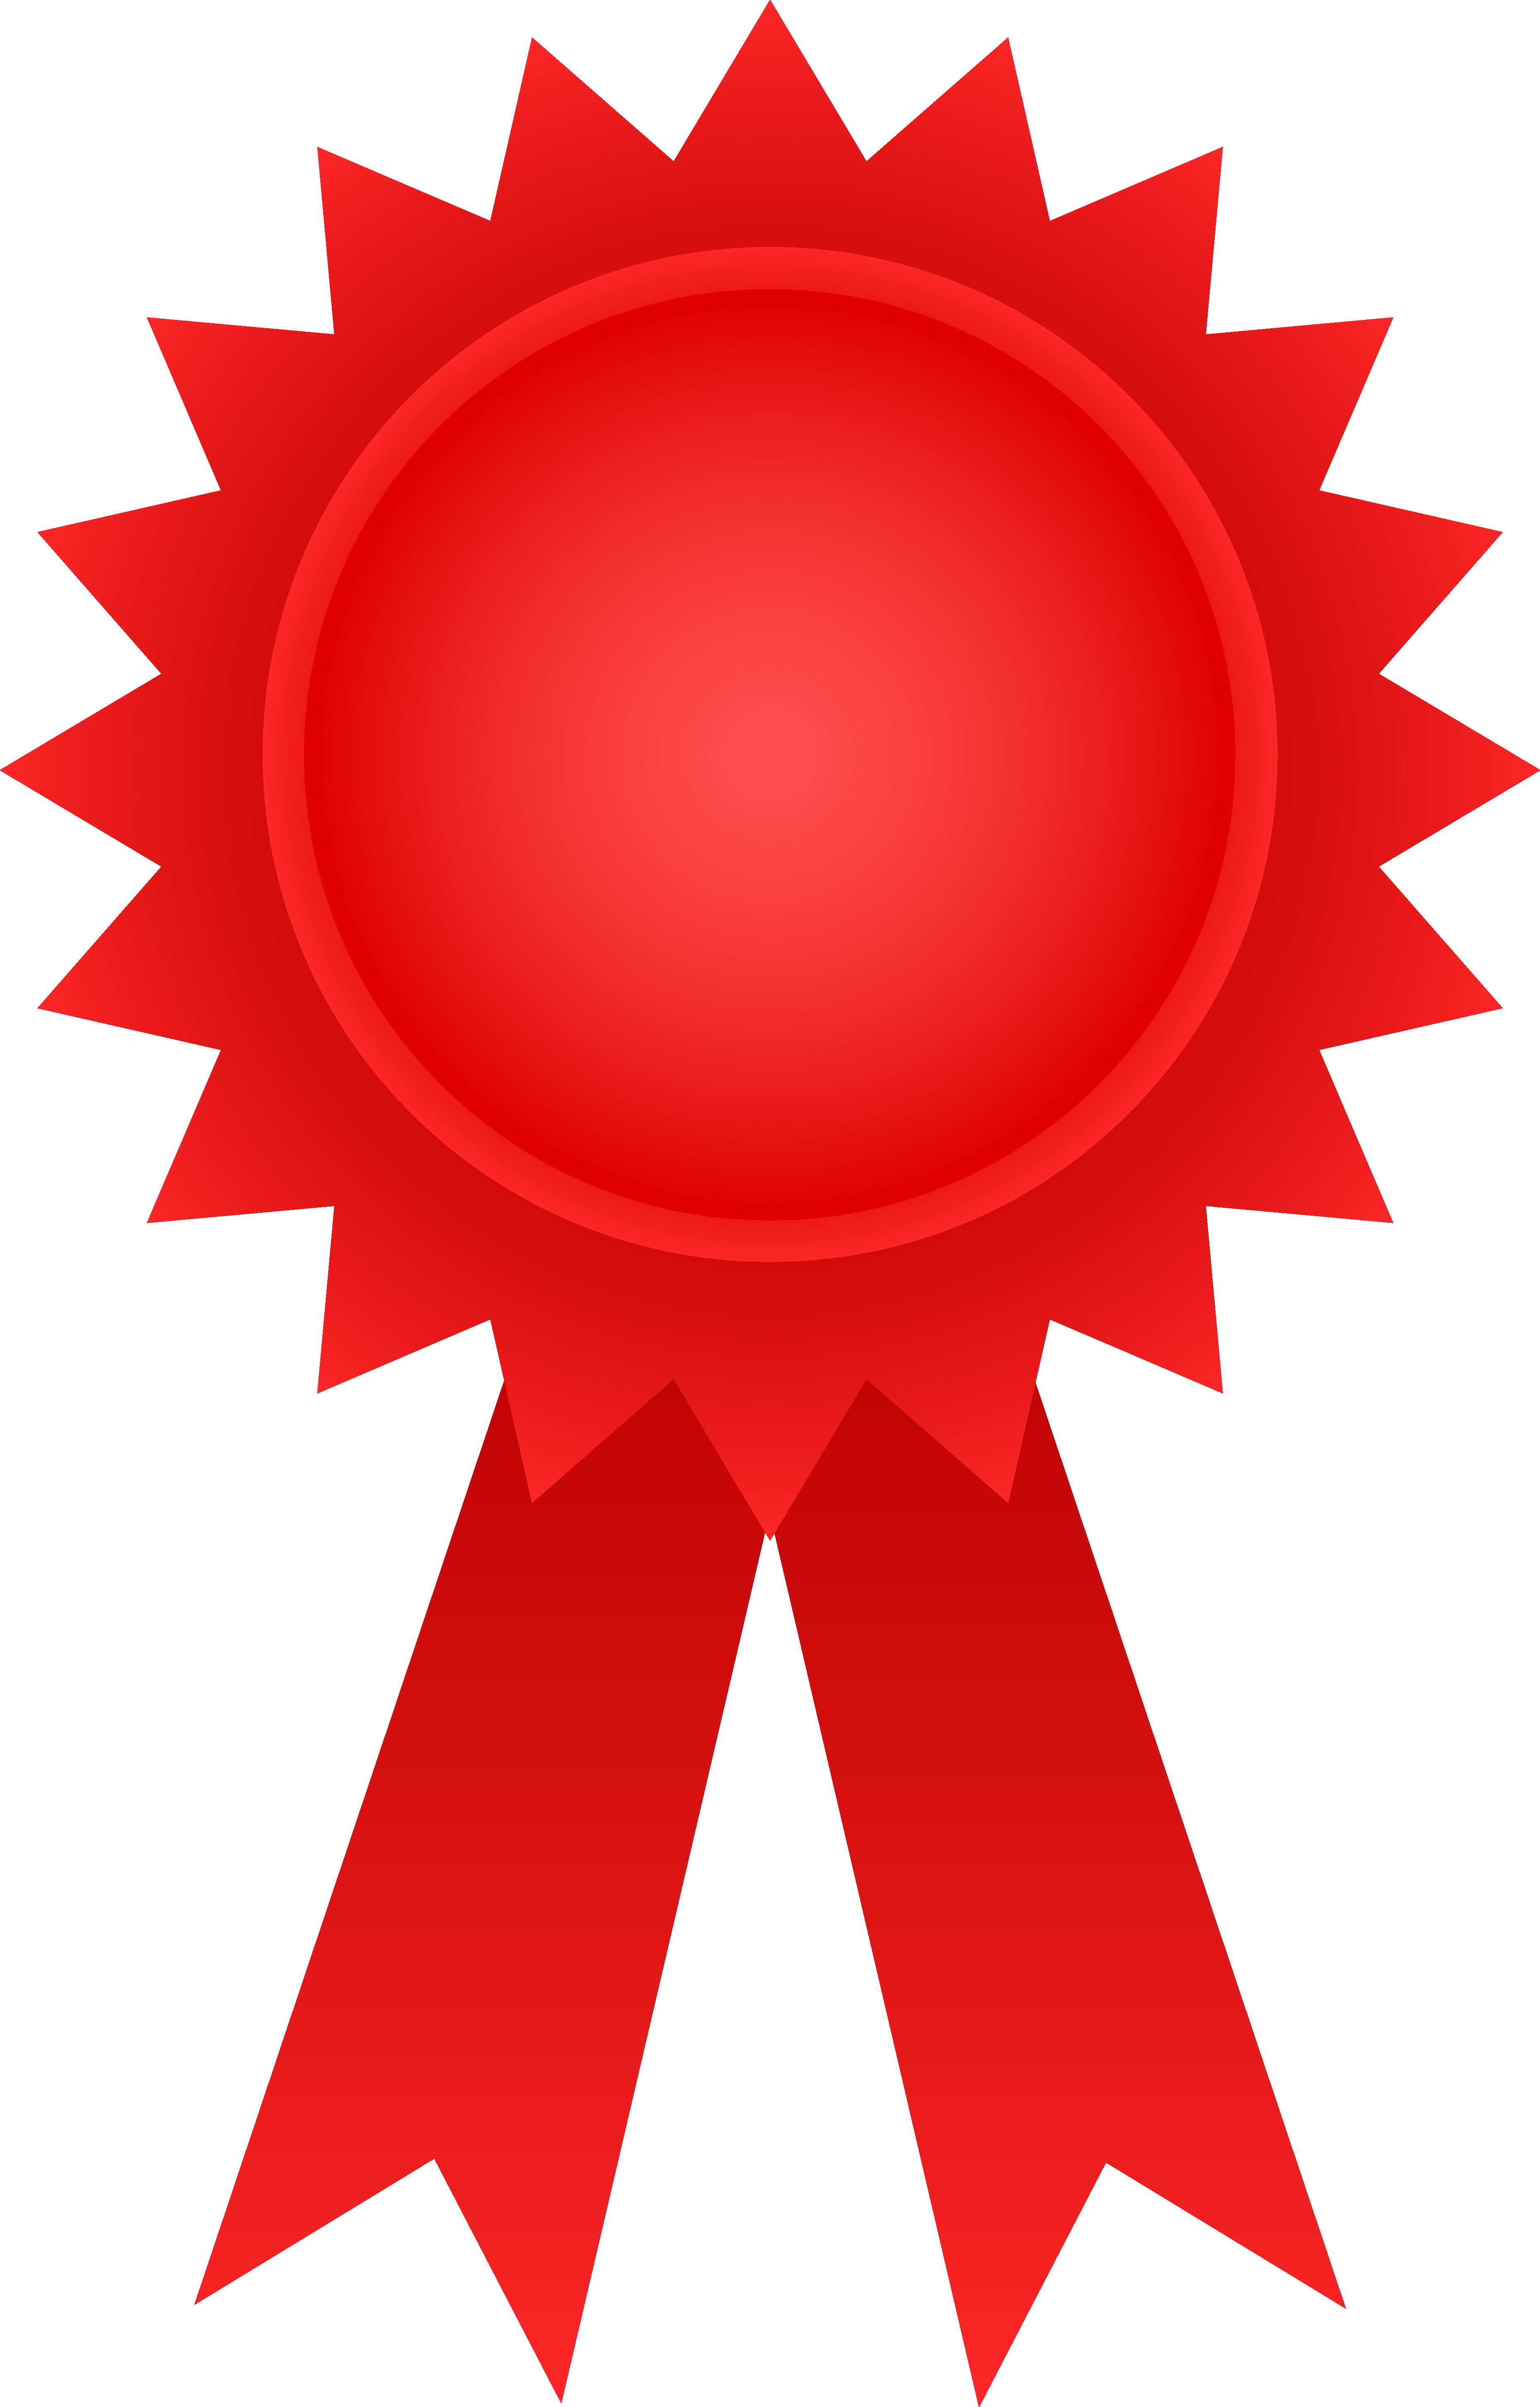 Award Ribbon Clipart Black And White-award ribbon clipart black and white-2